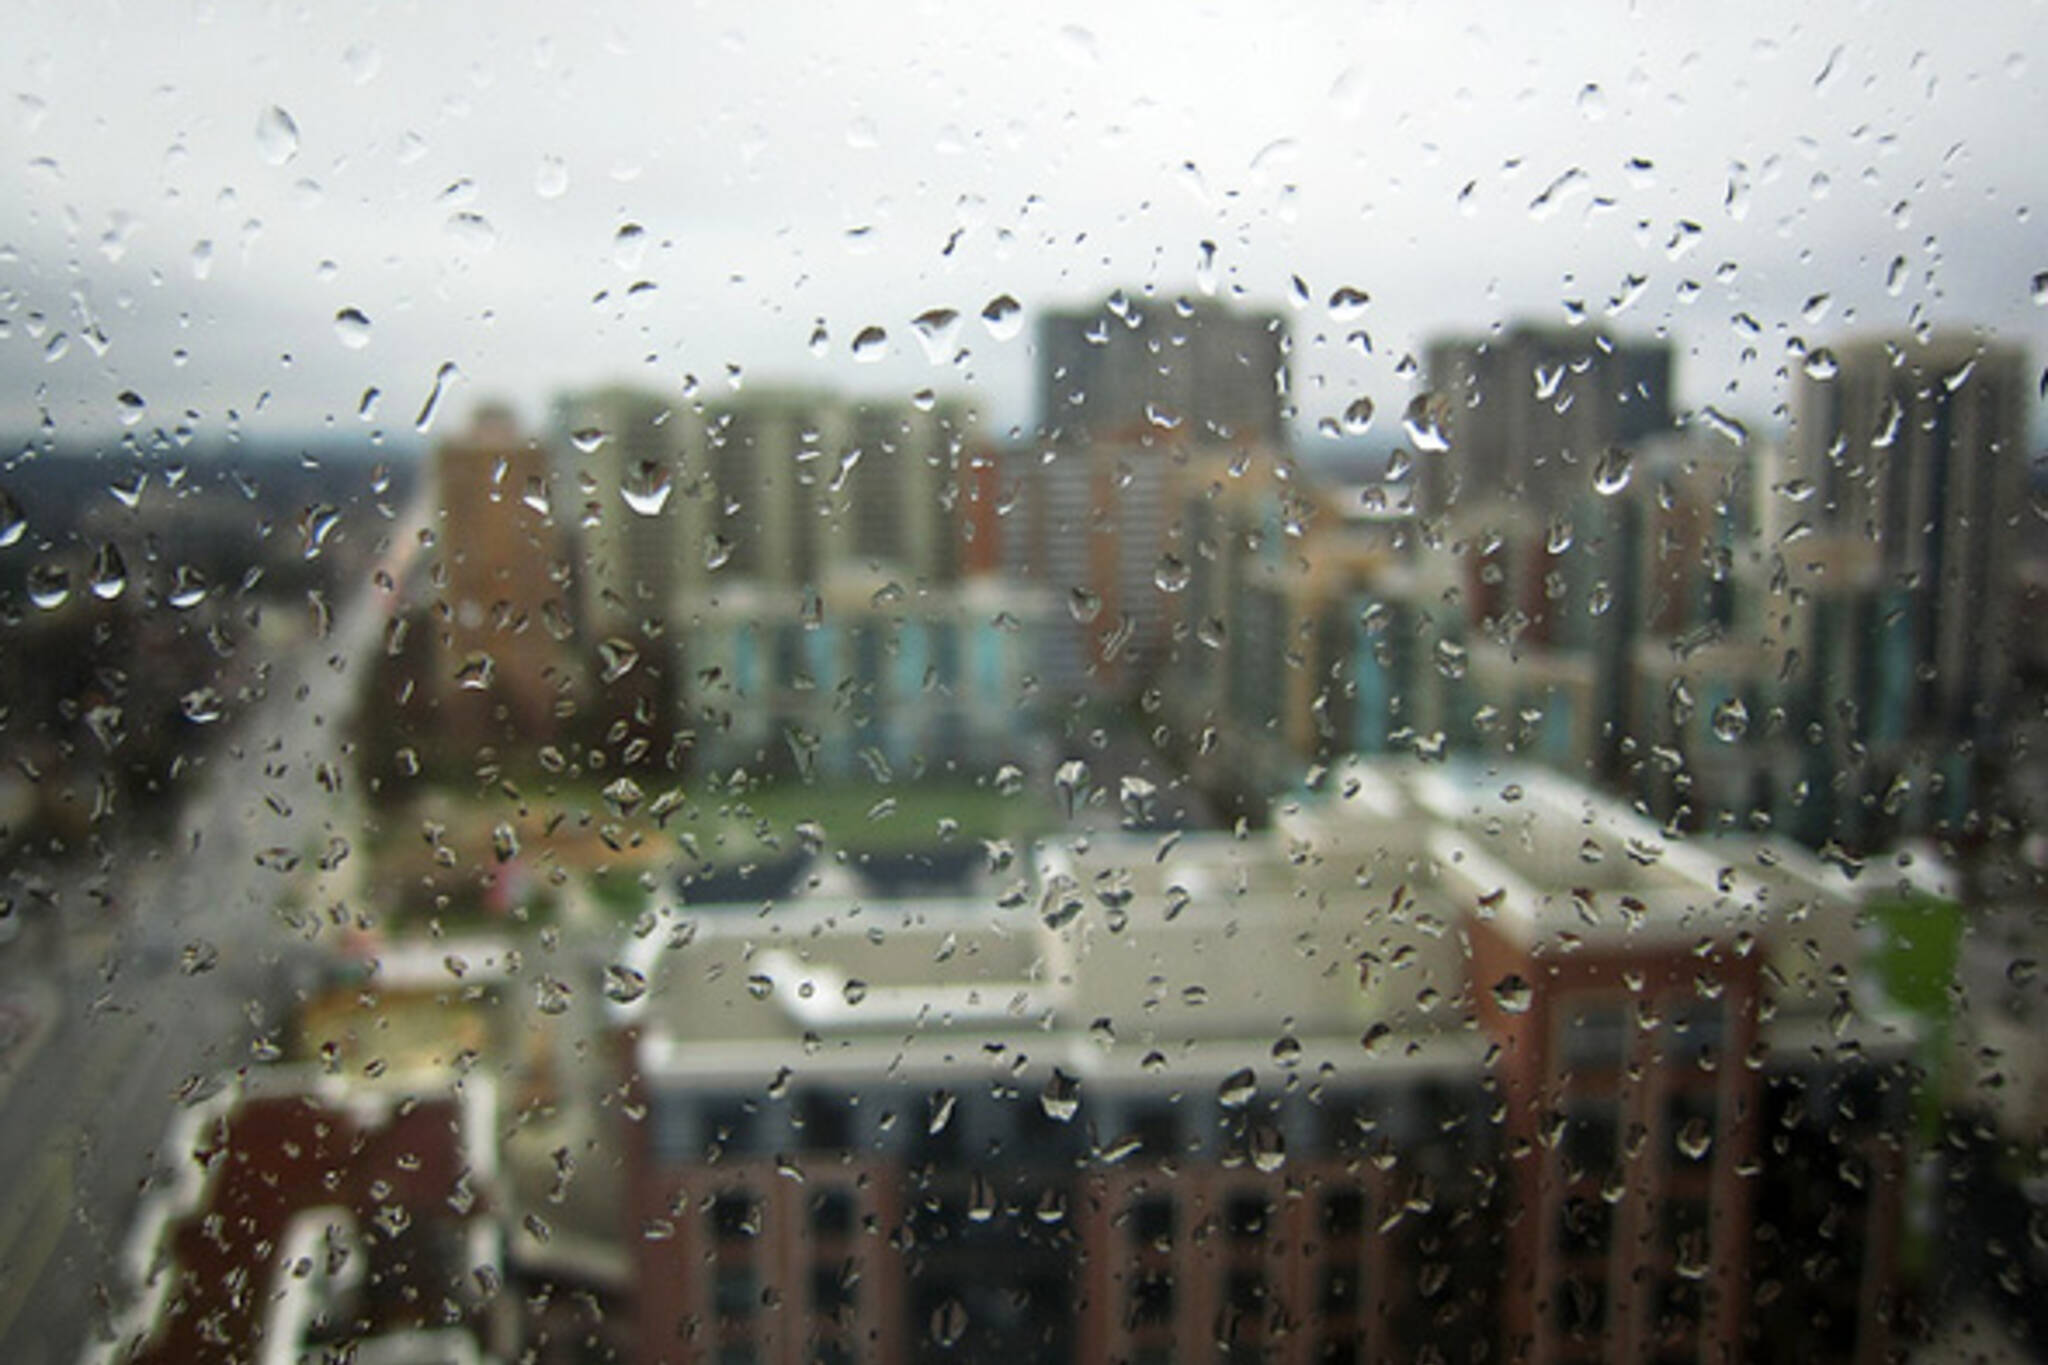 Rainy Toronto